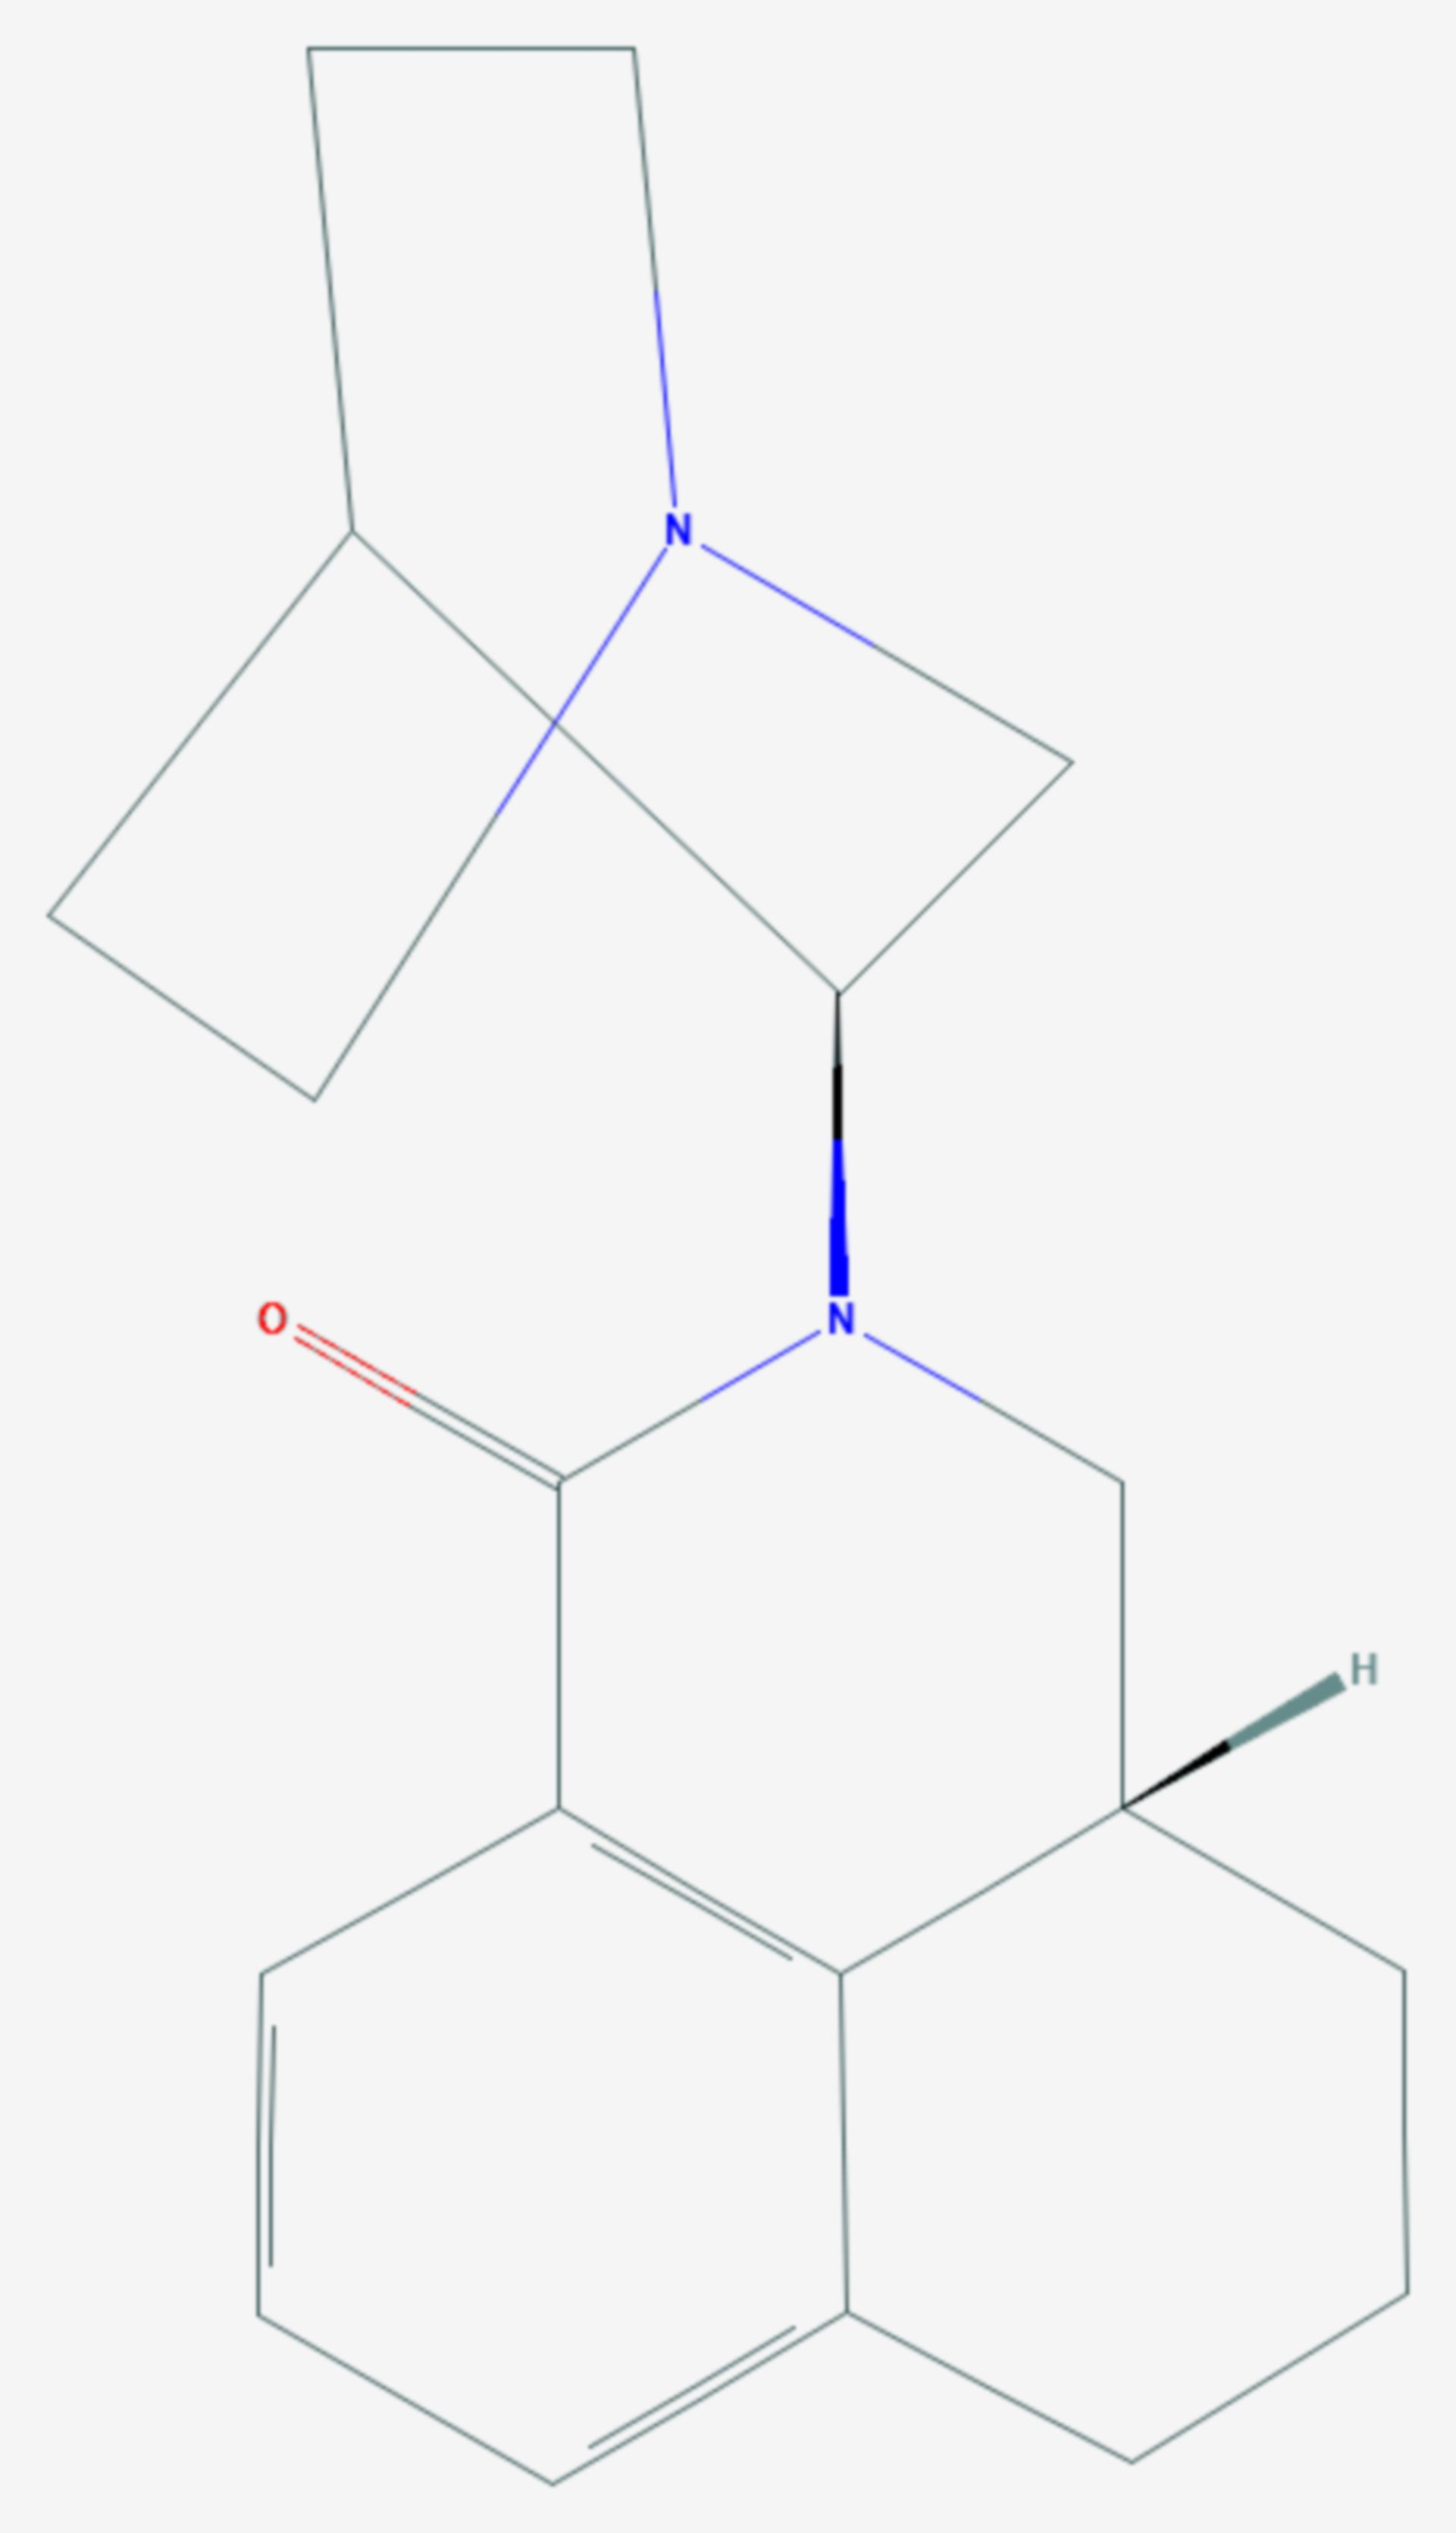 Palonosetron (Strukturformel)